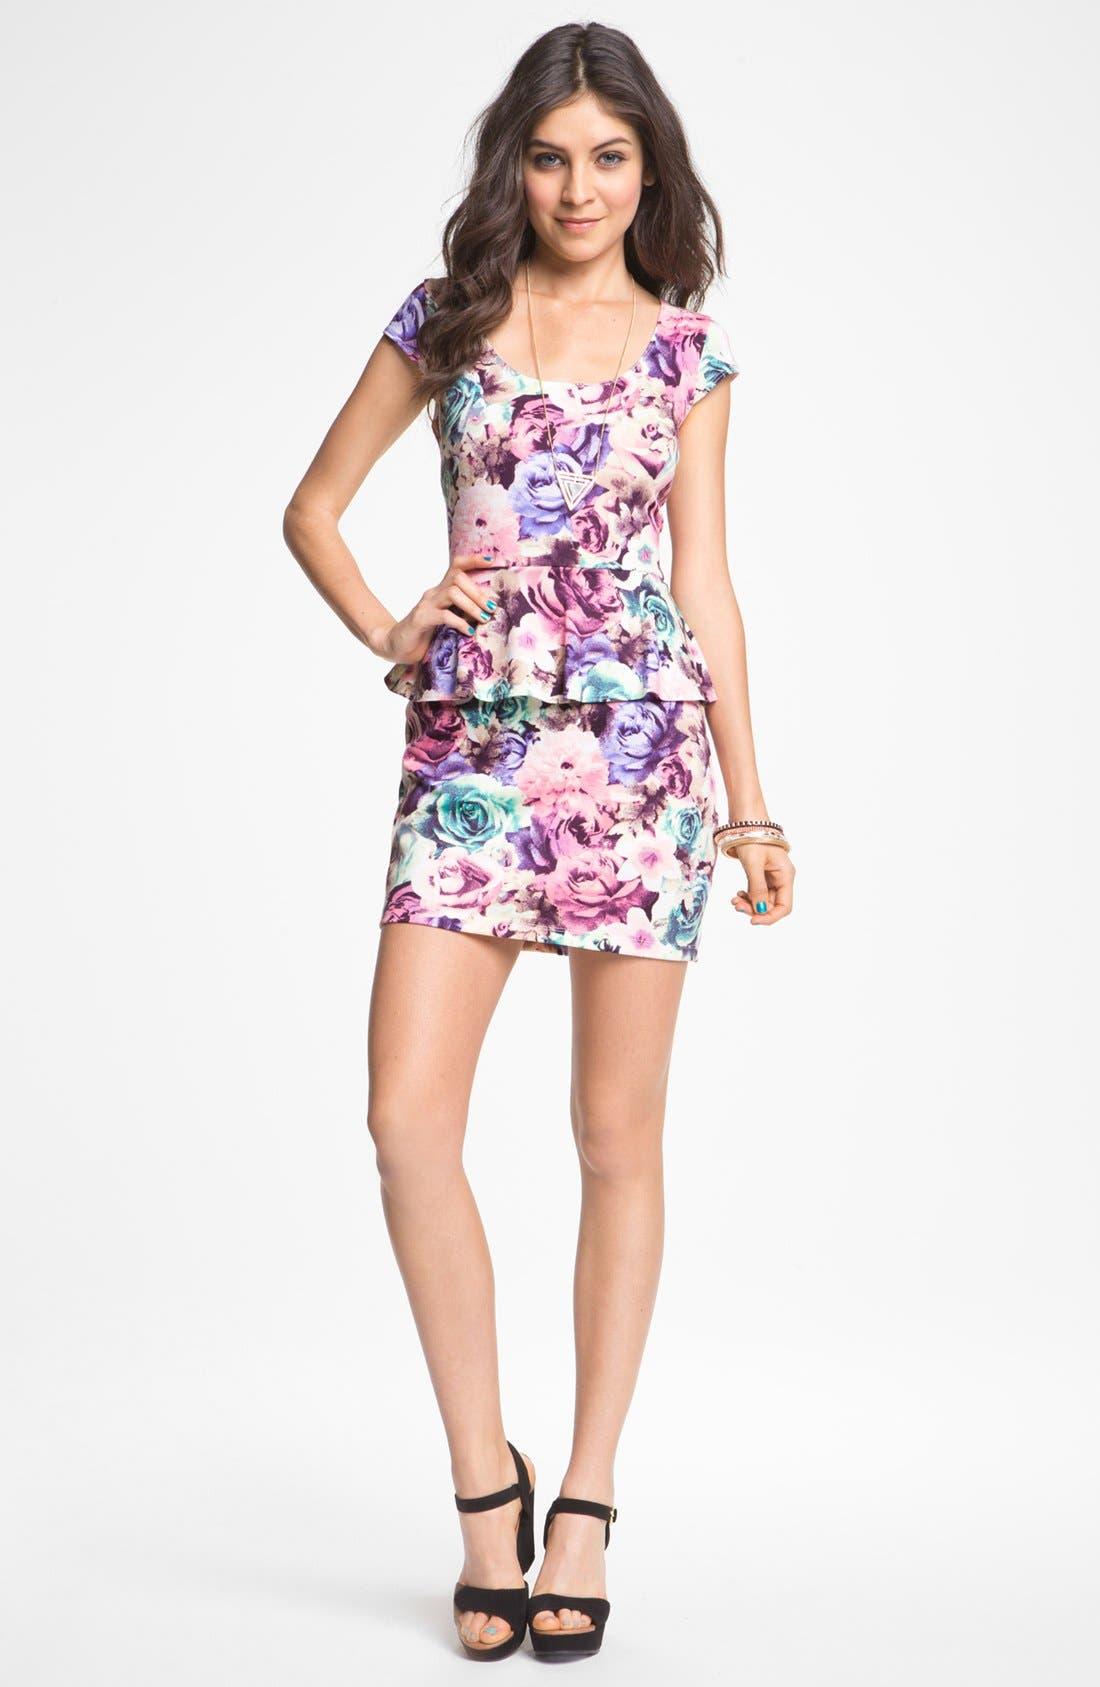 Alternate Image 1 Selected - As U Wish Floral Print Peplum Dress (Juniors)